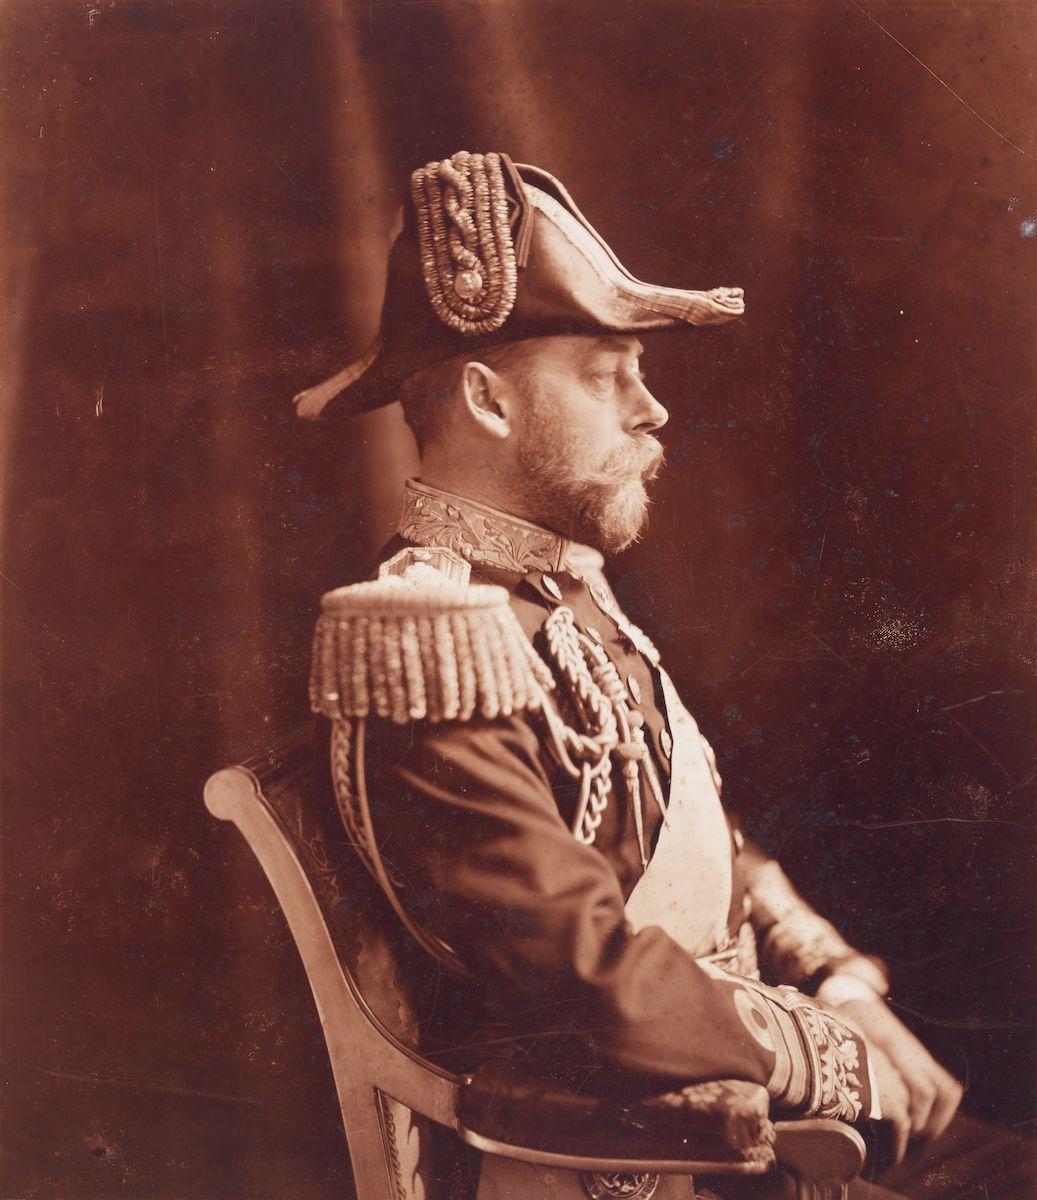 Duke of Cornwall and York (later King George V), 1903